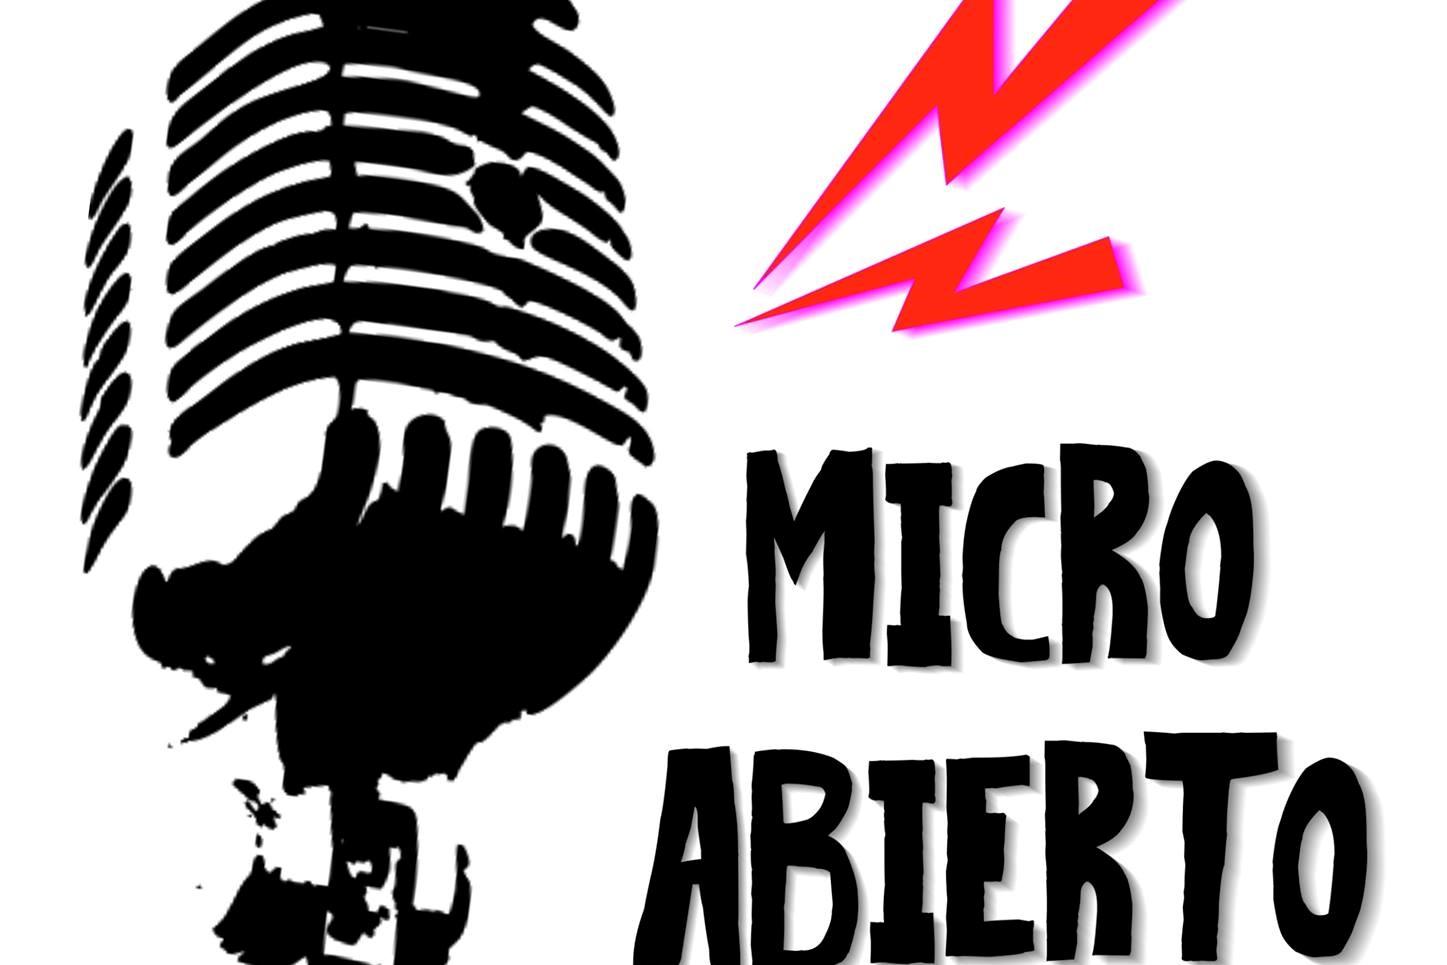 Micro Obert – CasalJove Klavija